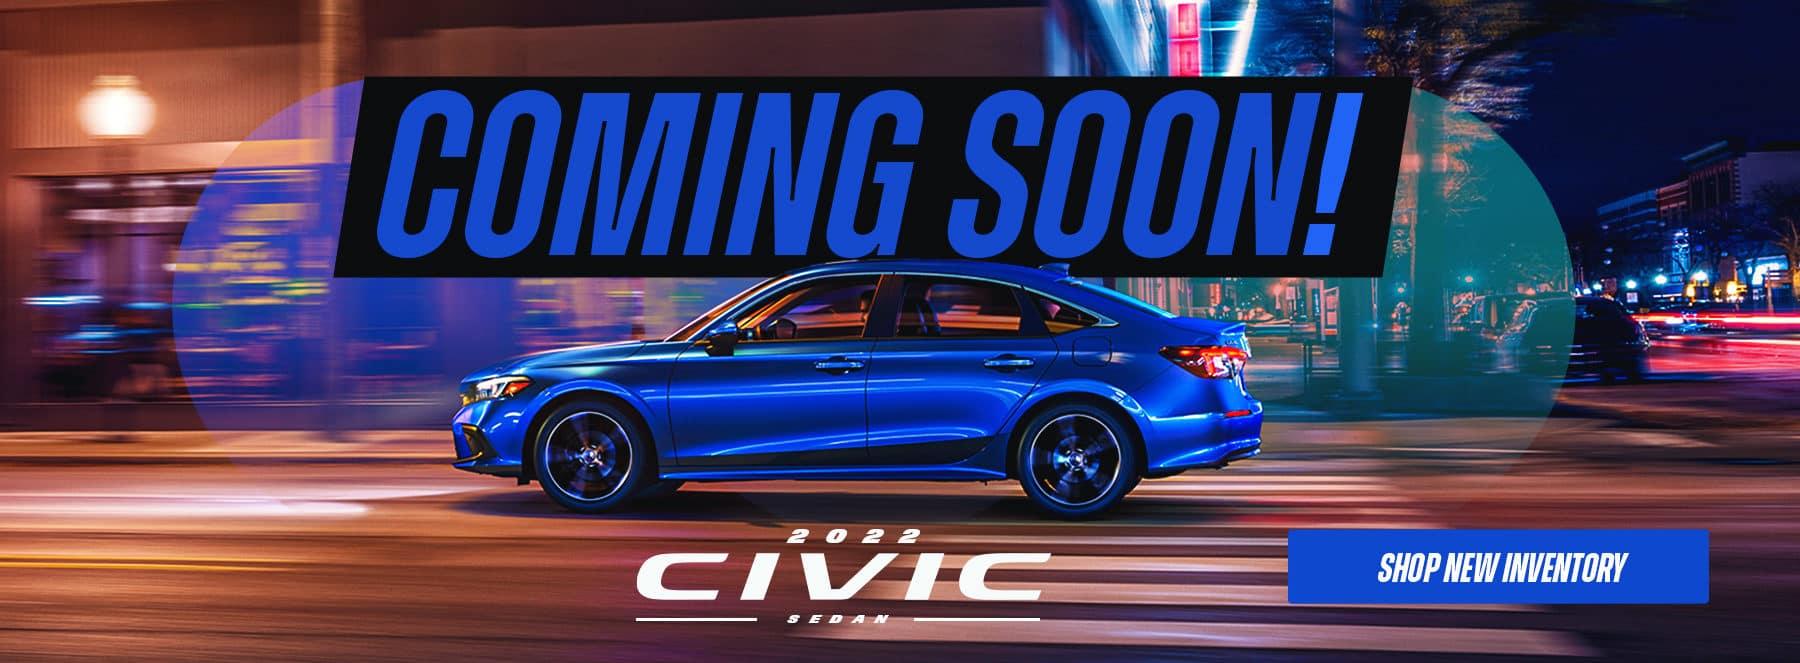 2022 Honda Civic Coming Soon Roswell GA